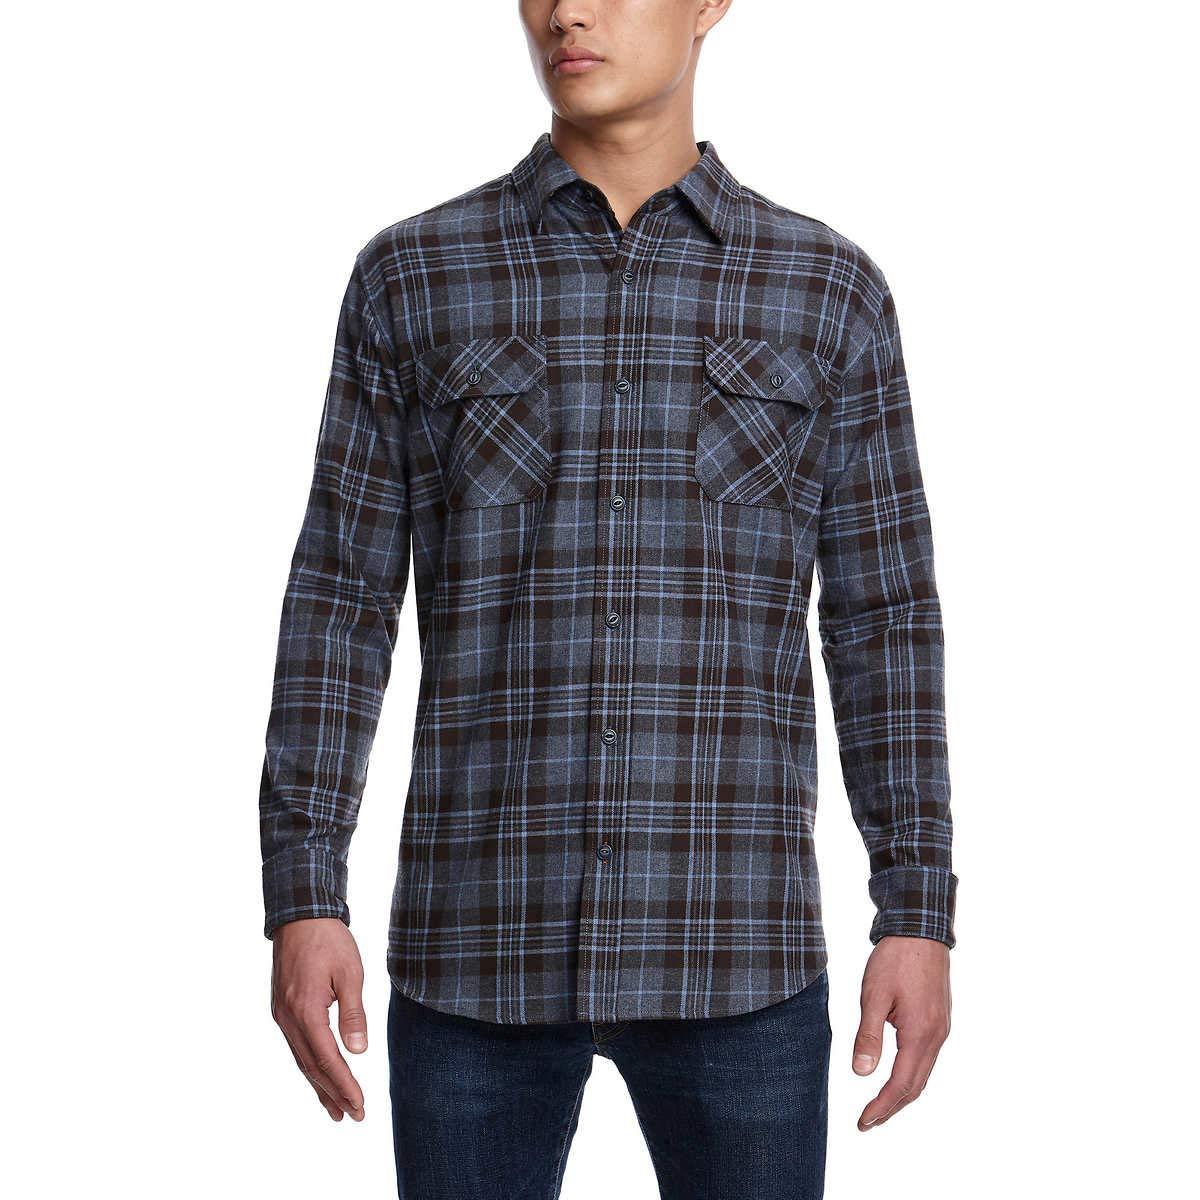 Weatherproof Vintage Men/'s Flannel Button Down Shirt